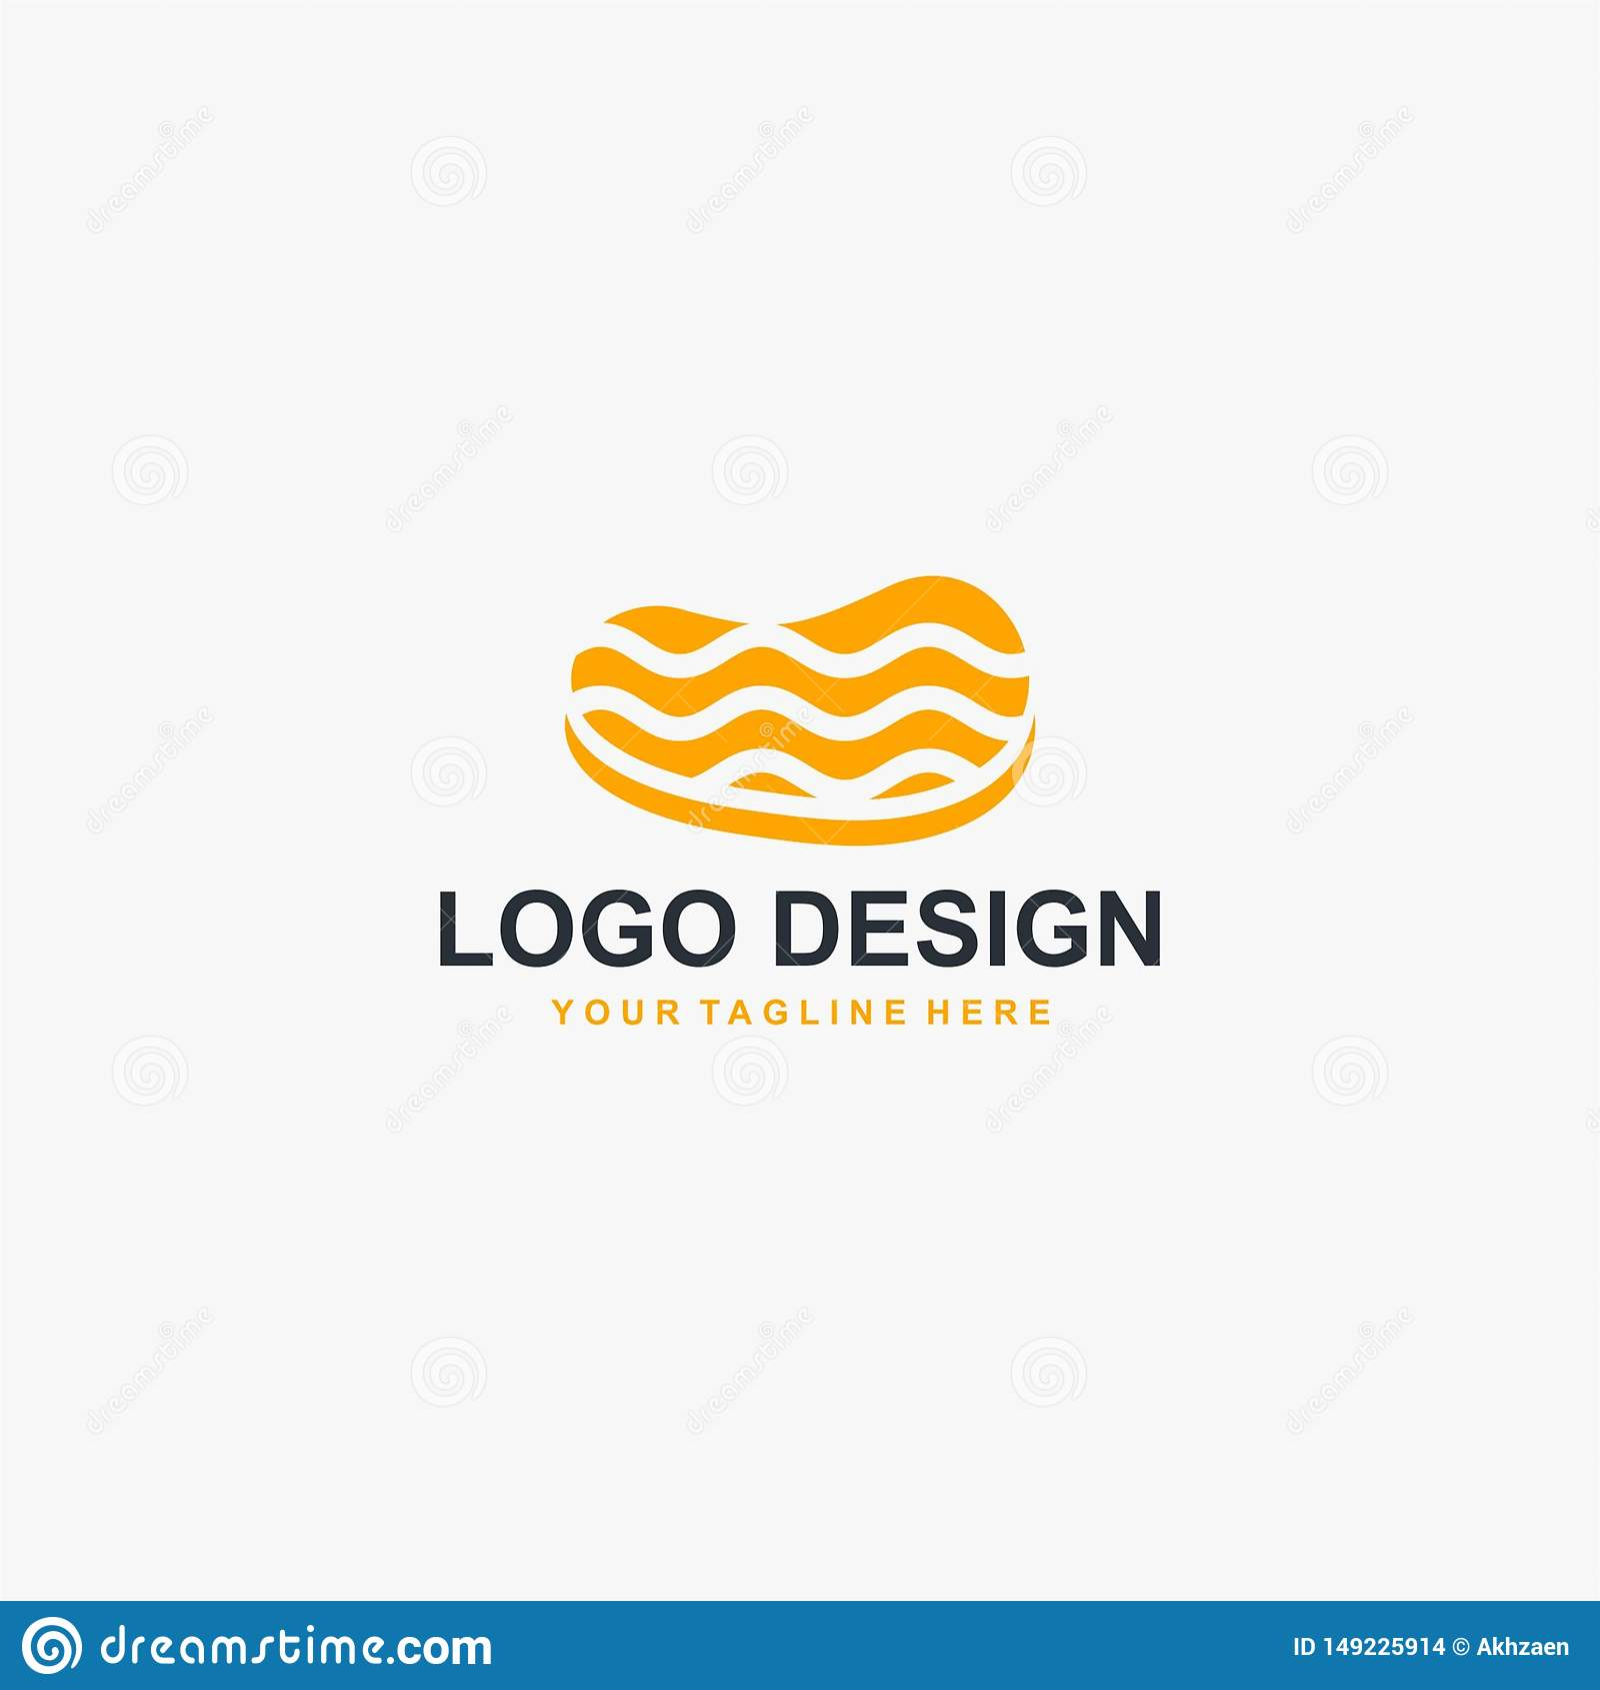 Steak meat logo design vector. Food logo design for restaurant business.